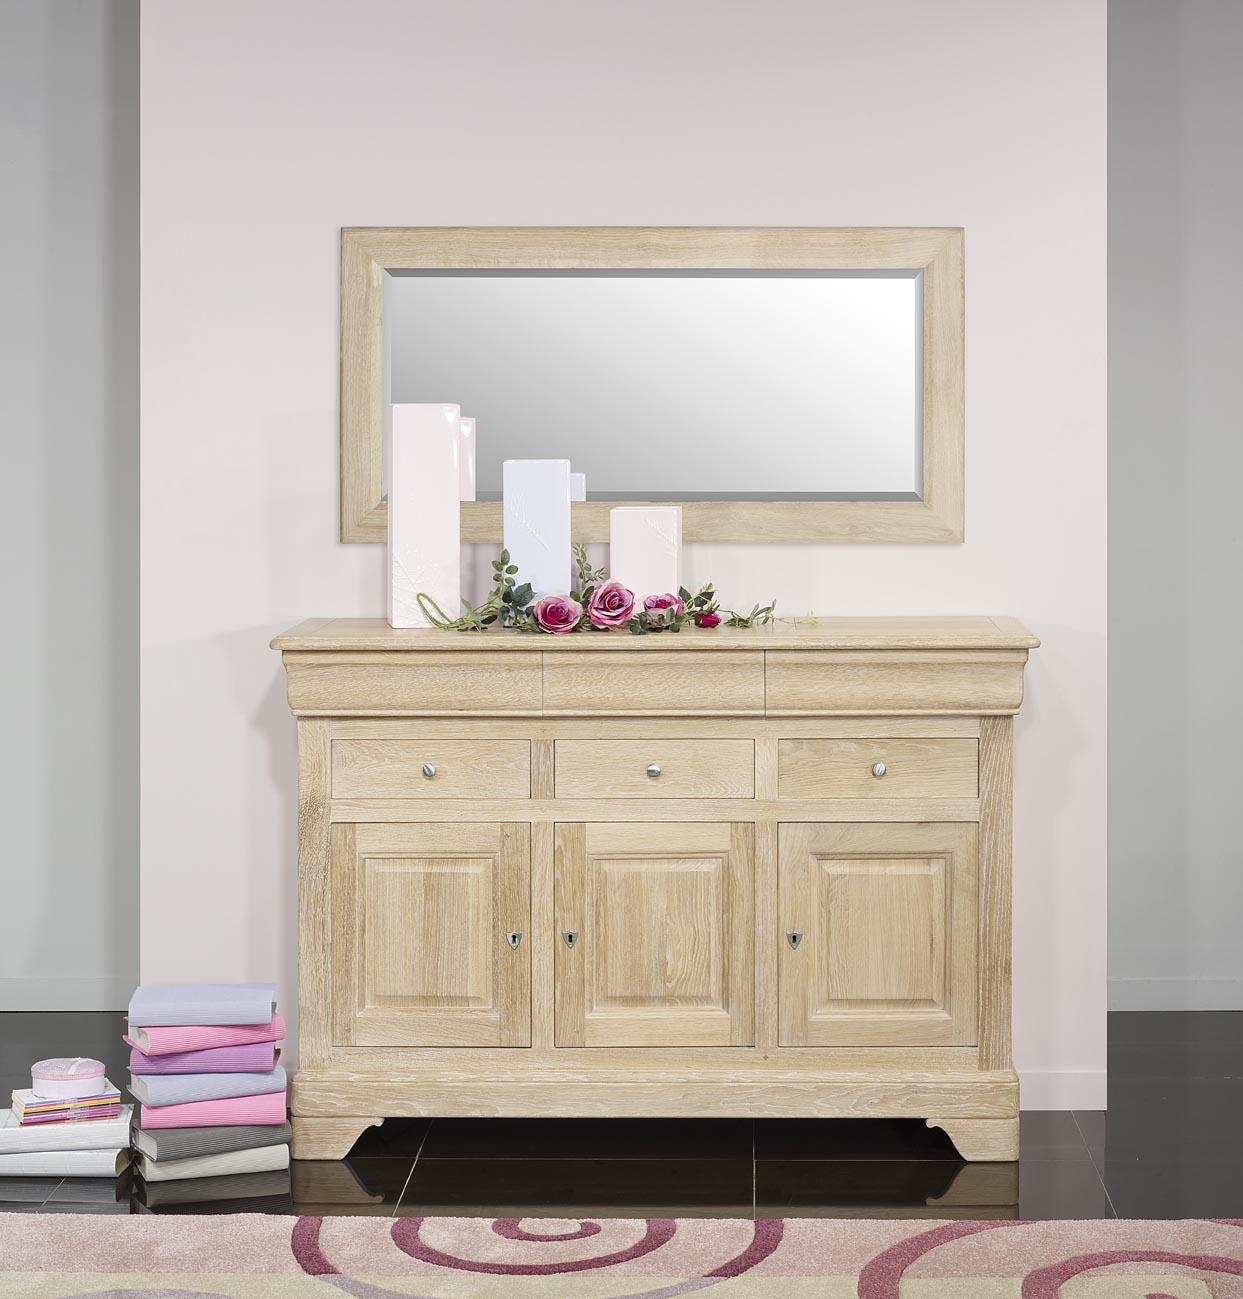 miroir glace biseaut e 120x60 en ch ne massif finition ch ne bross meuble en ch ne massif. Black Bedroom Furniture Sets. Home Design Ideas